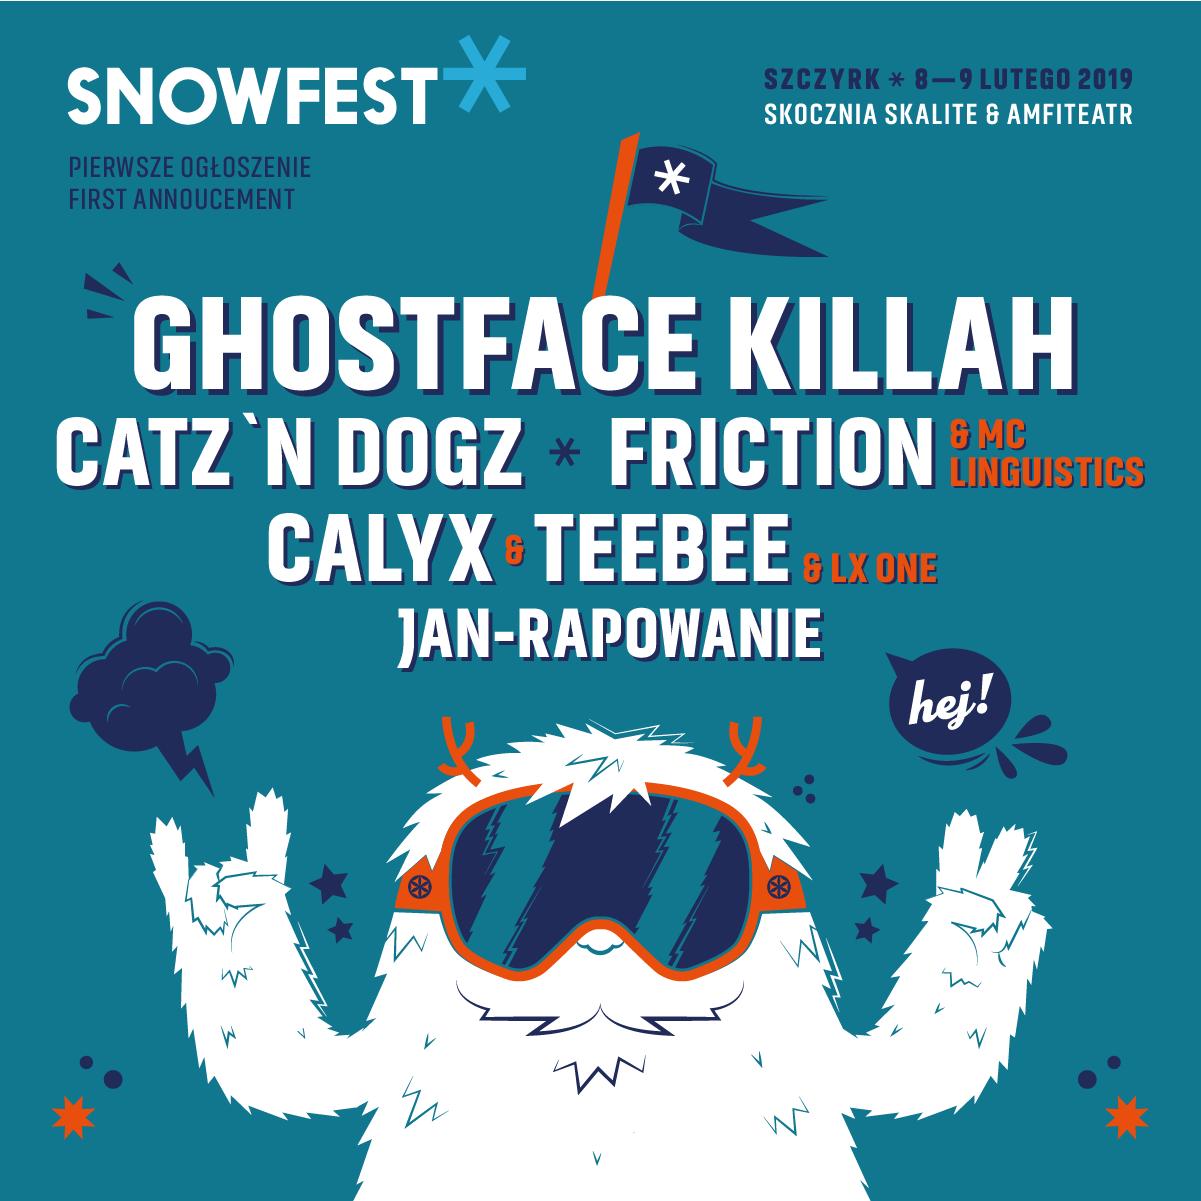 snowfest_baner_press1.png